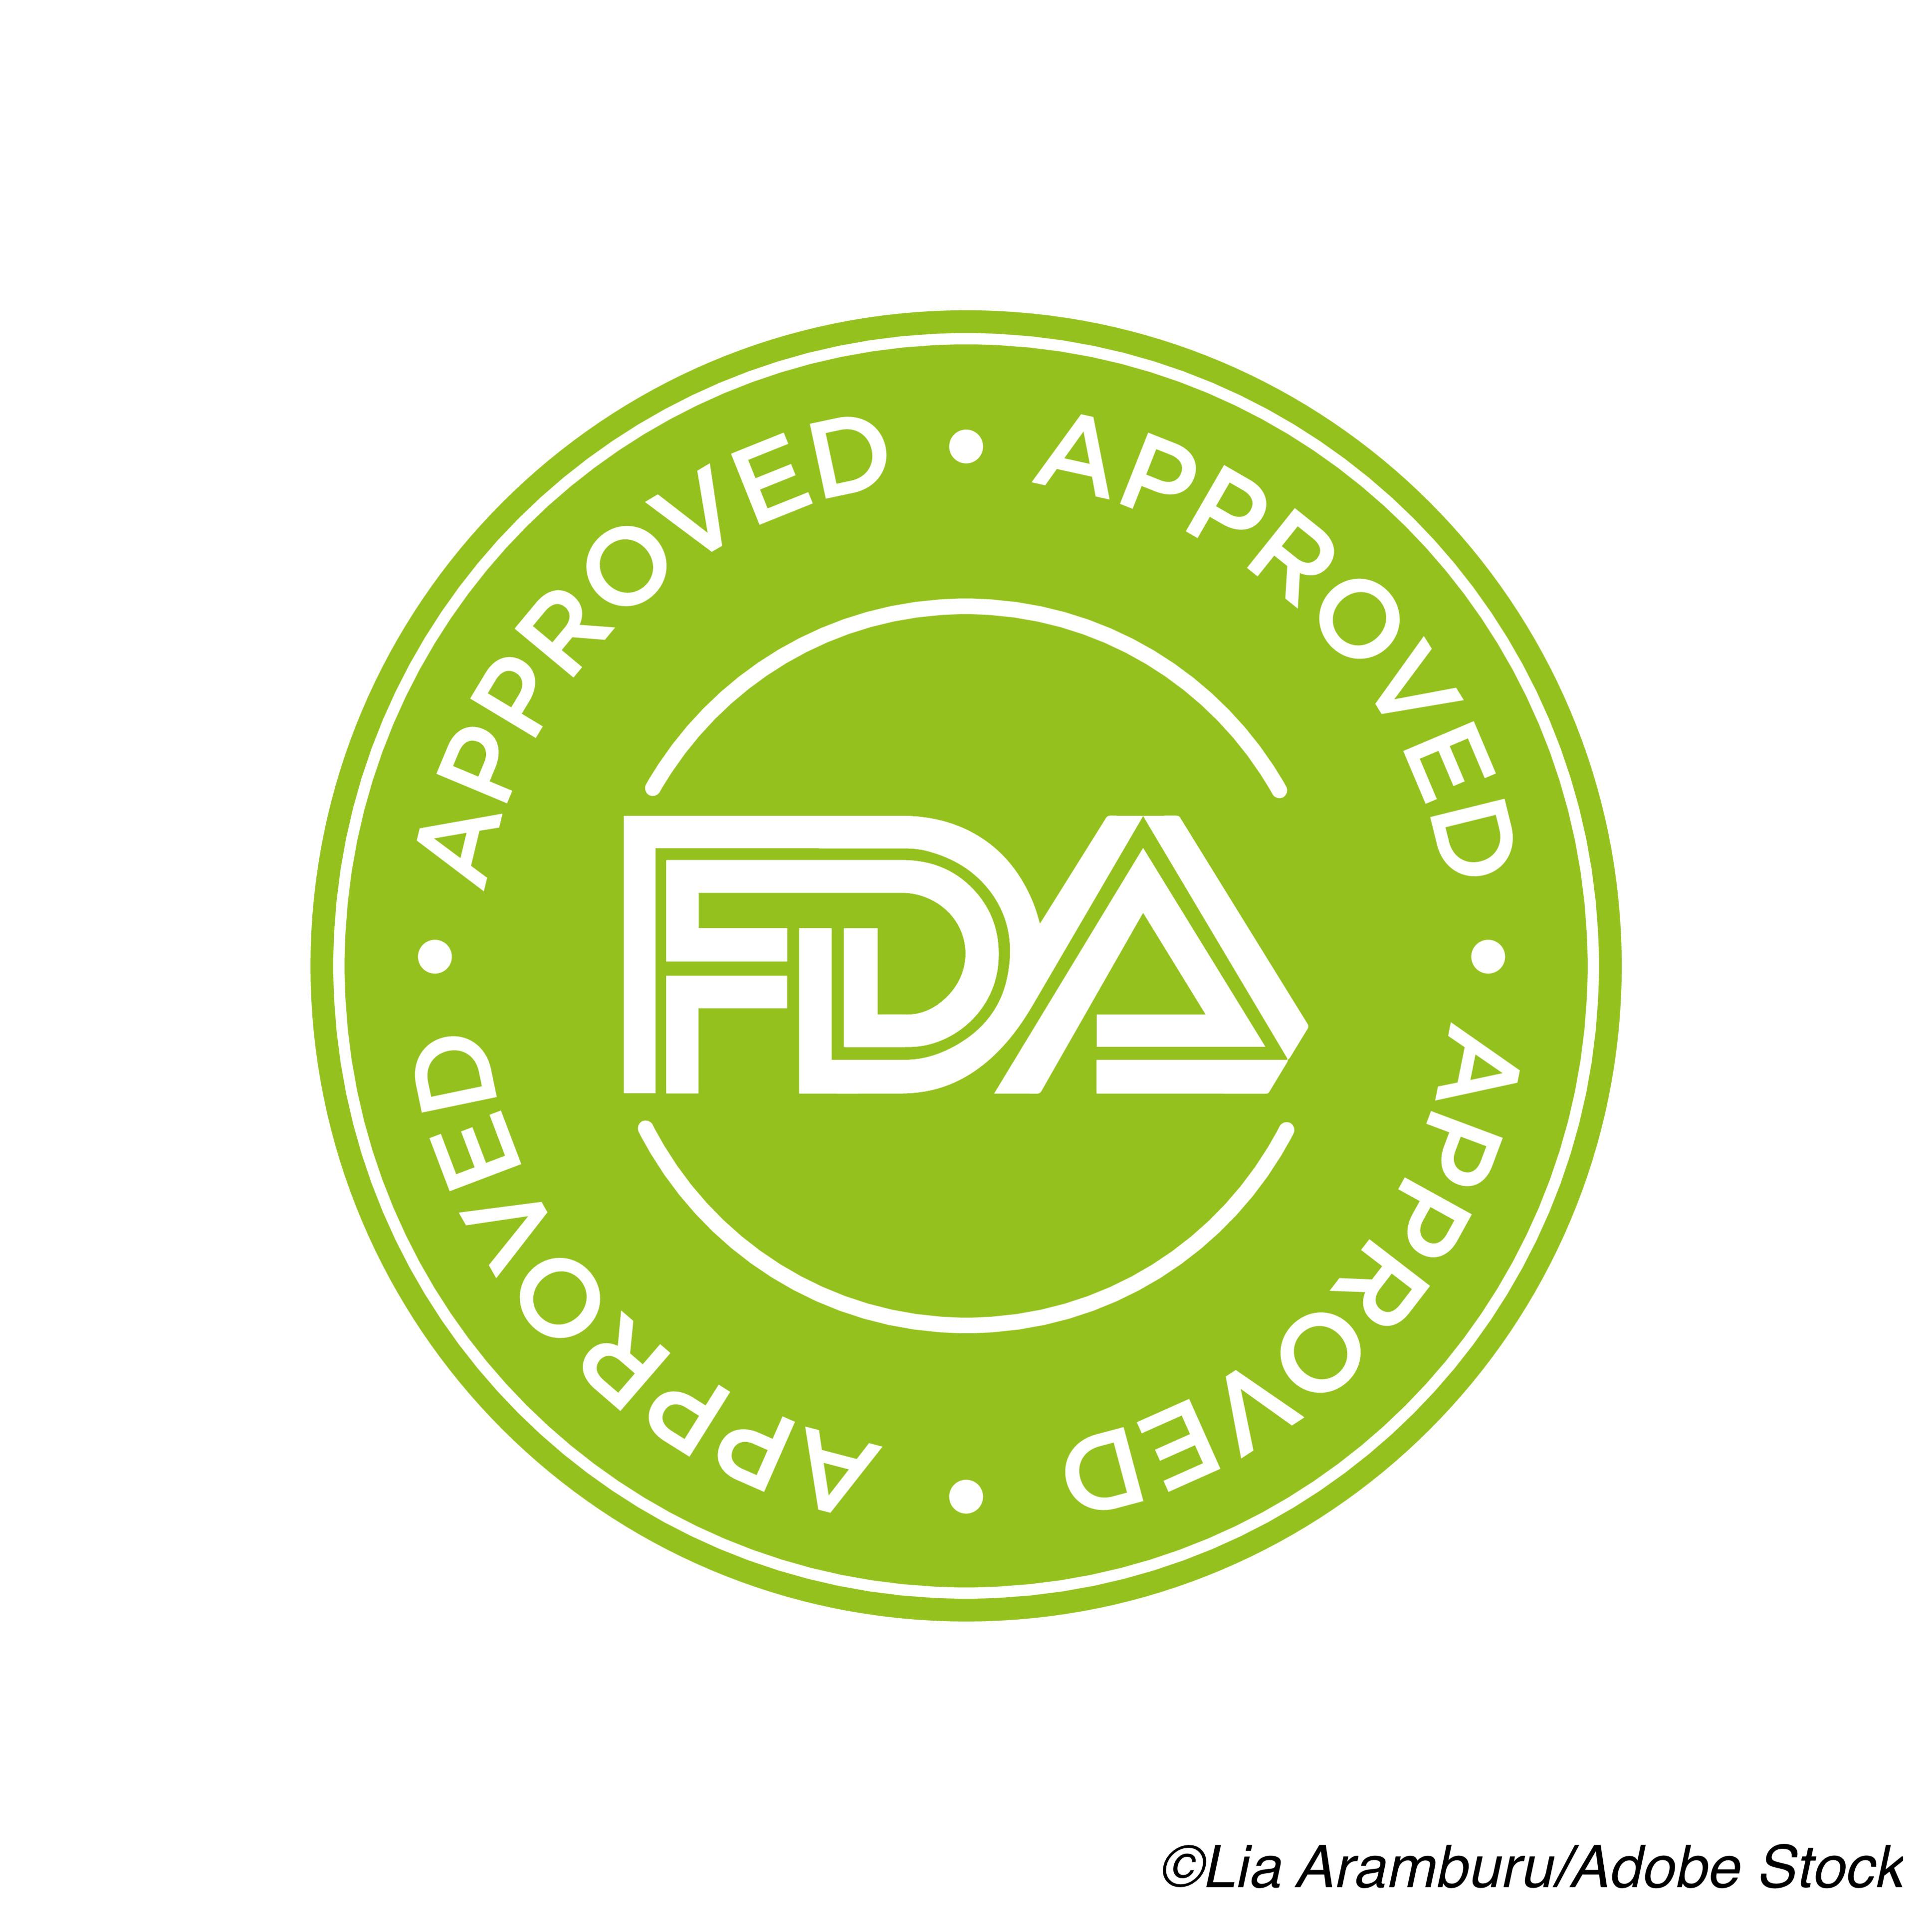 FDA Approves Drug to Combat Chemotherapy-Linked Bone Marrow Damage